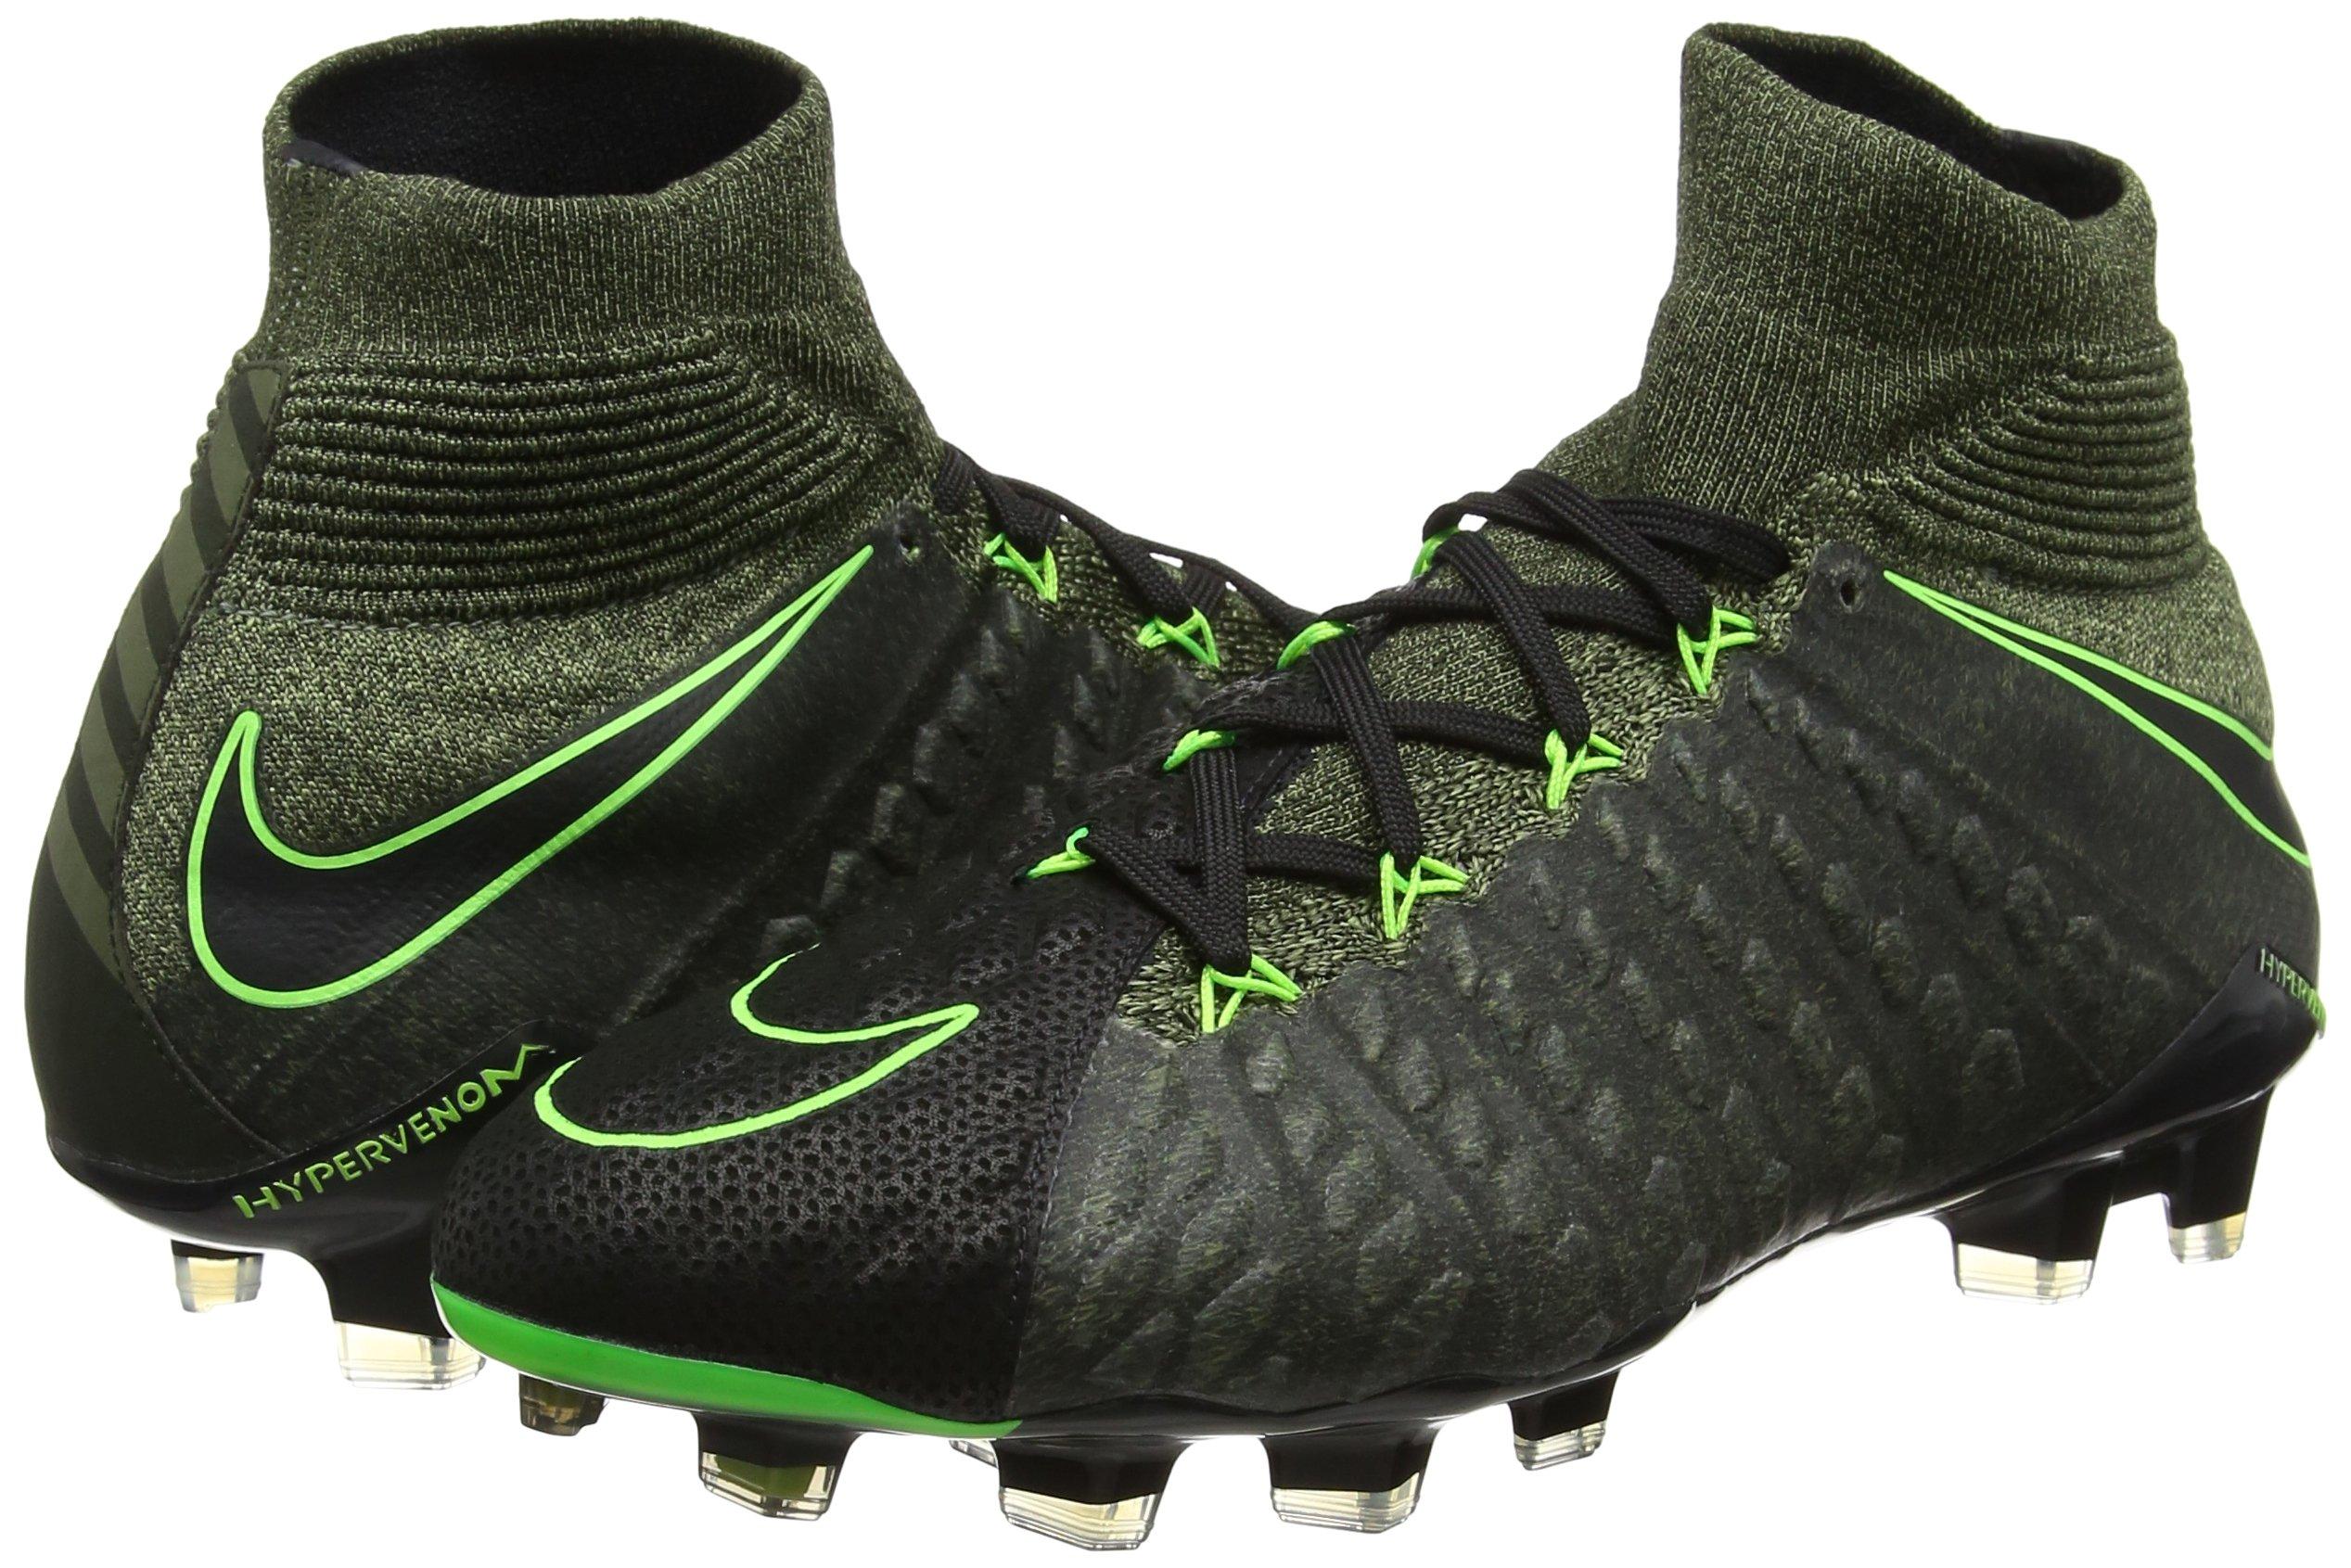 huge discount a8856 73659 ایگرد - خرید از آمازون | Nike Hypervenom Phantom III Dynamic ...